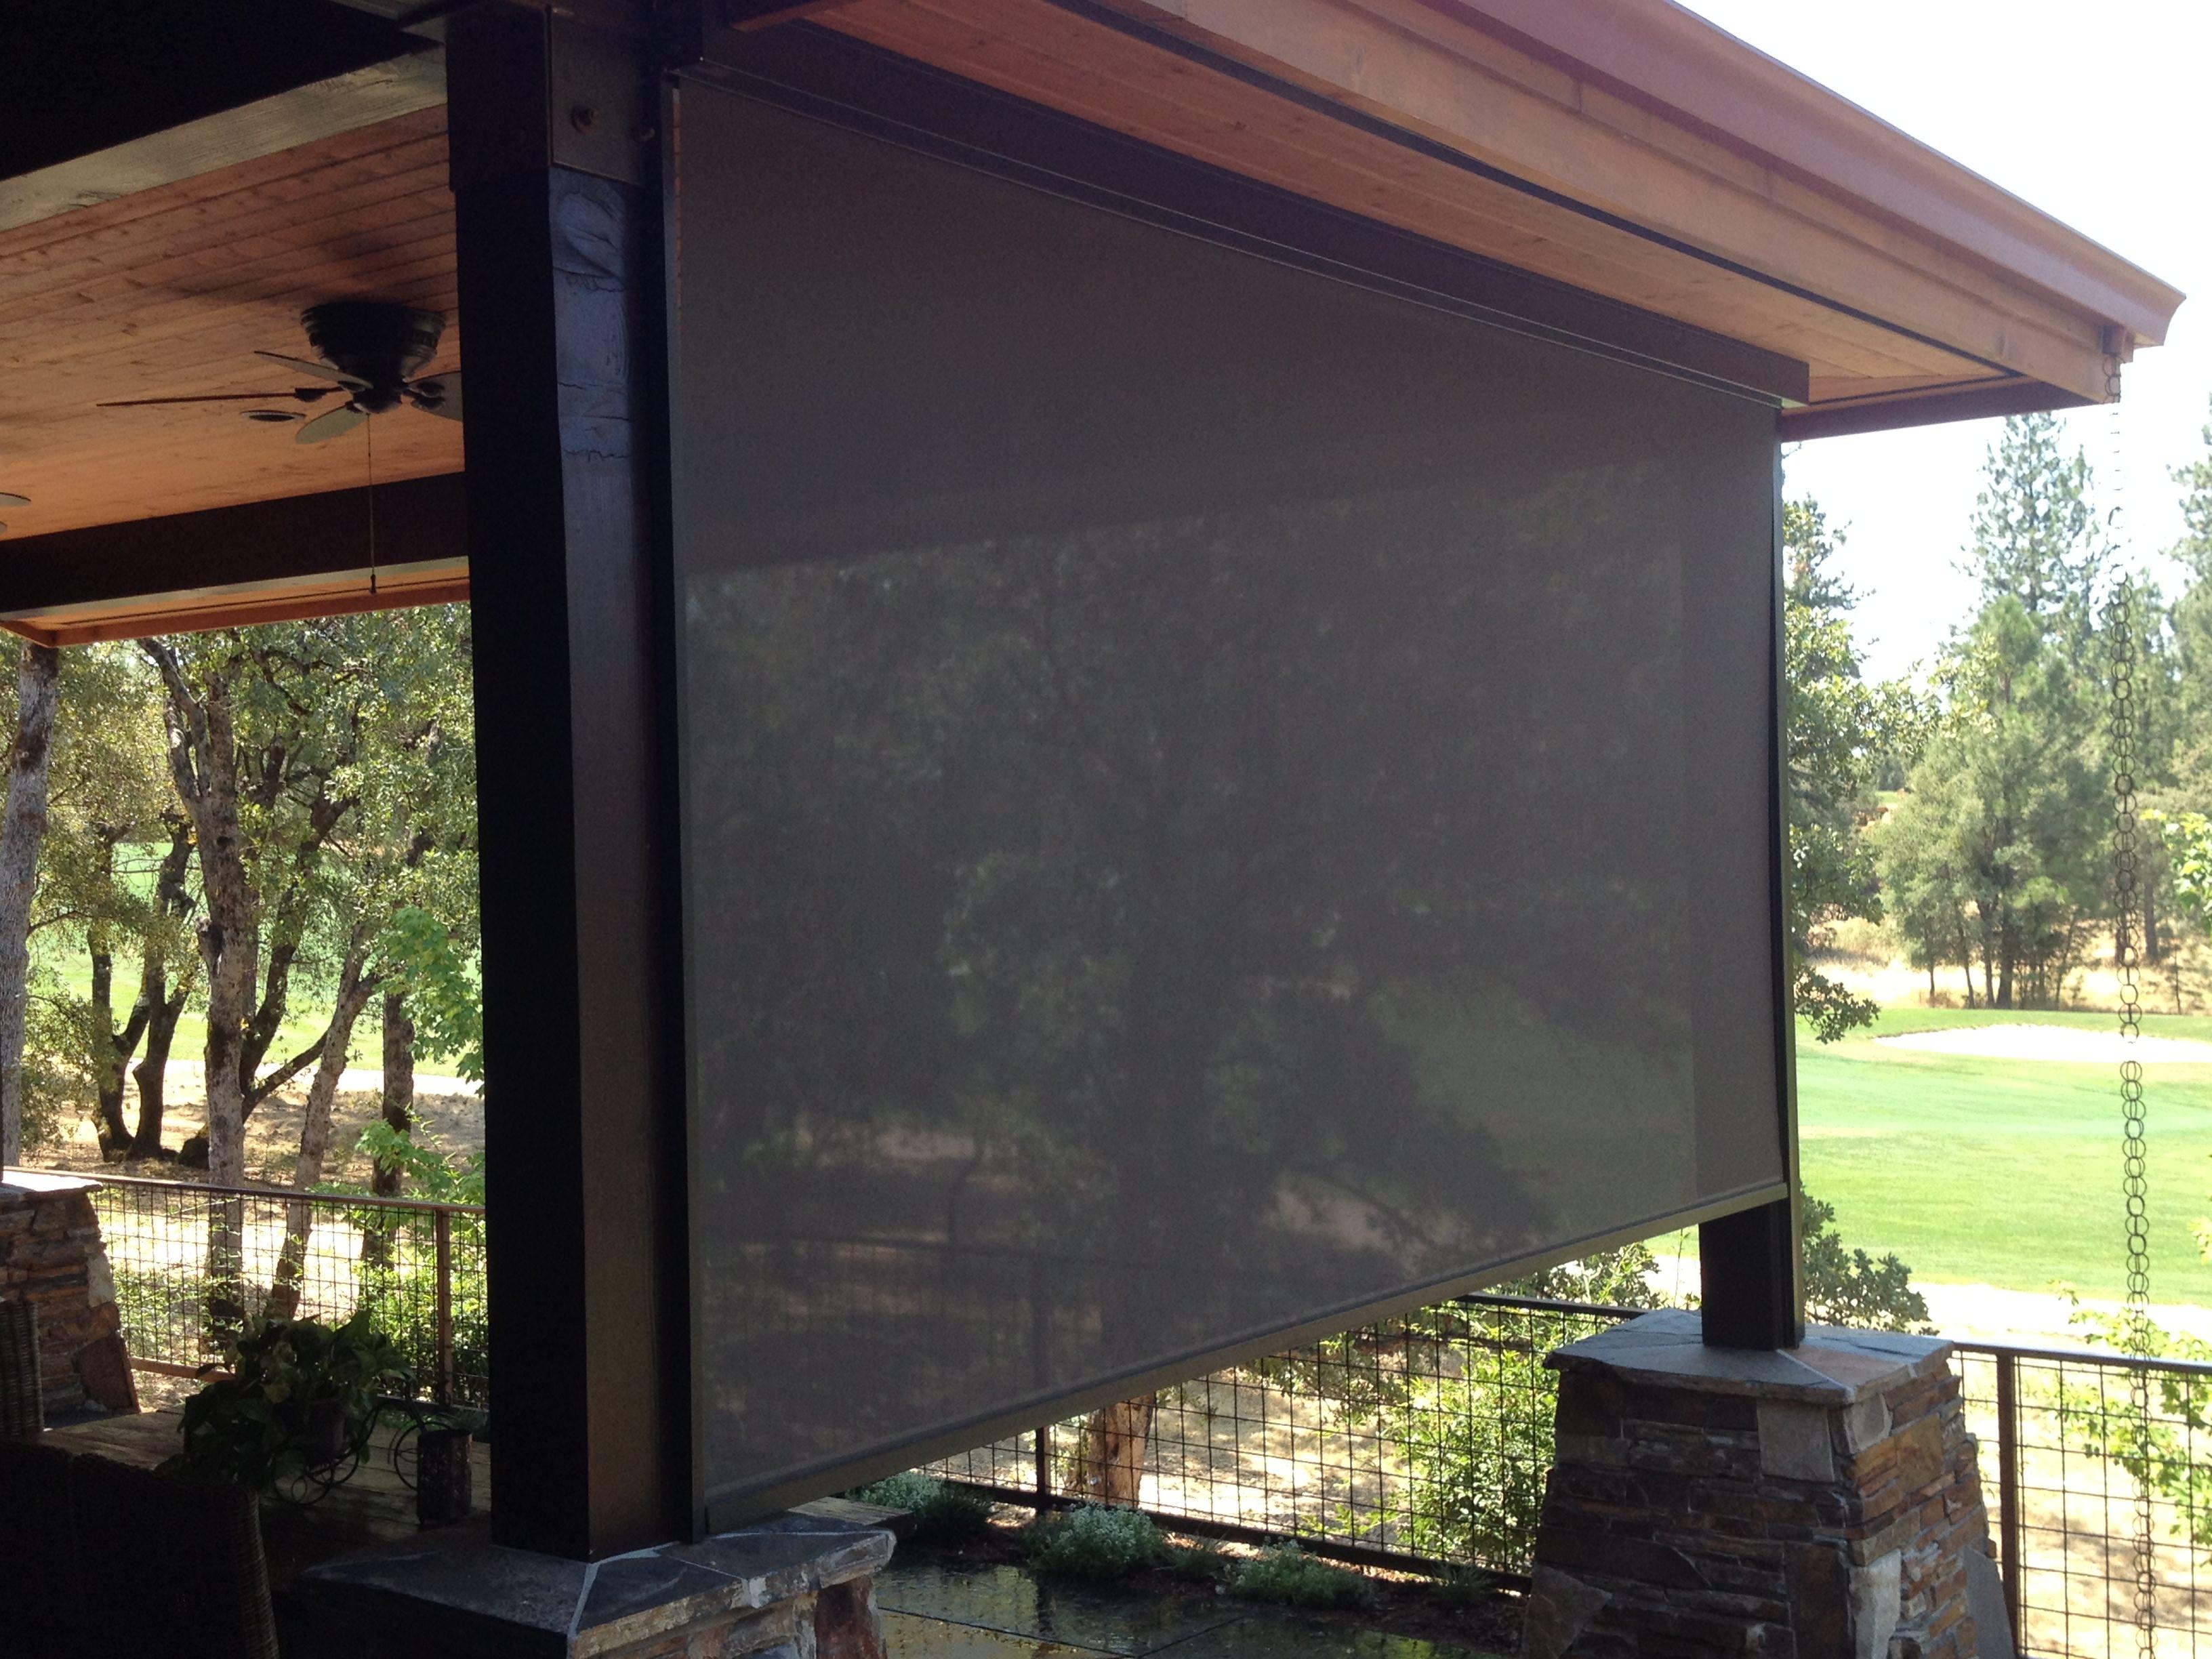 screens 4 less